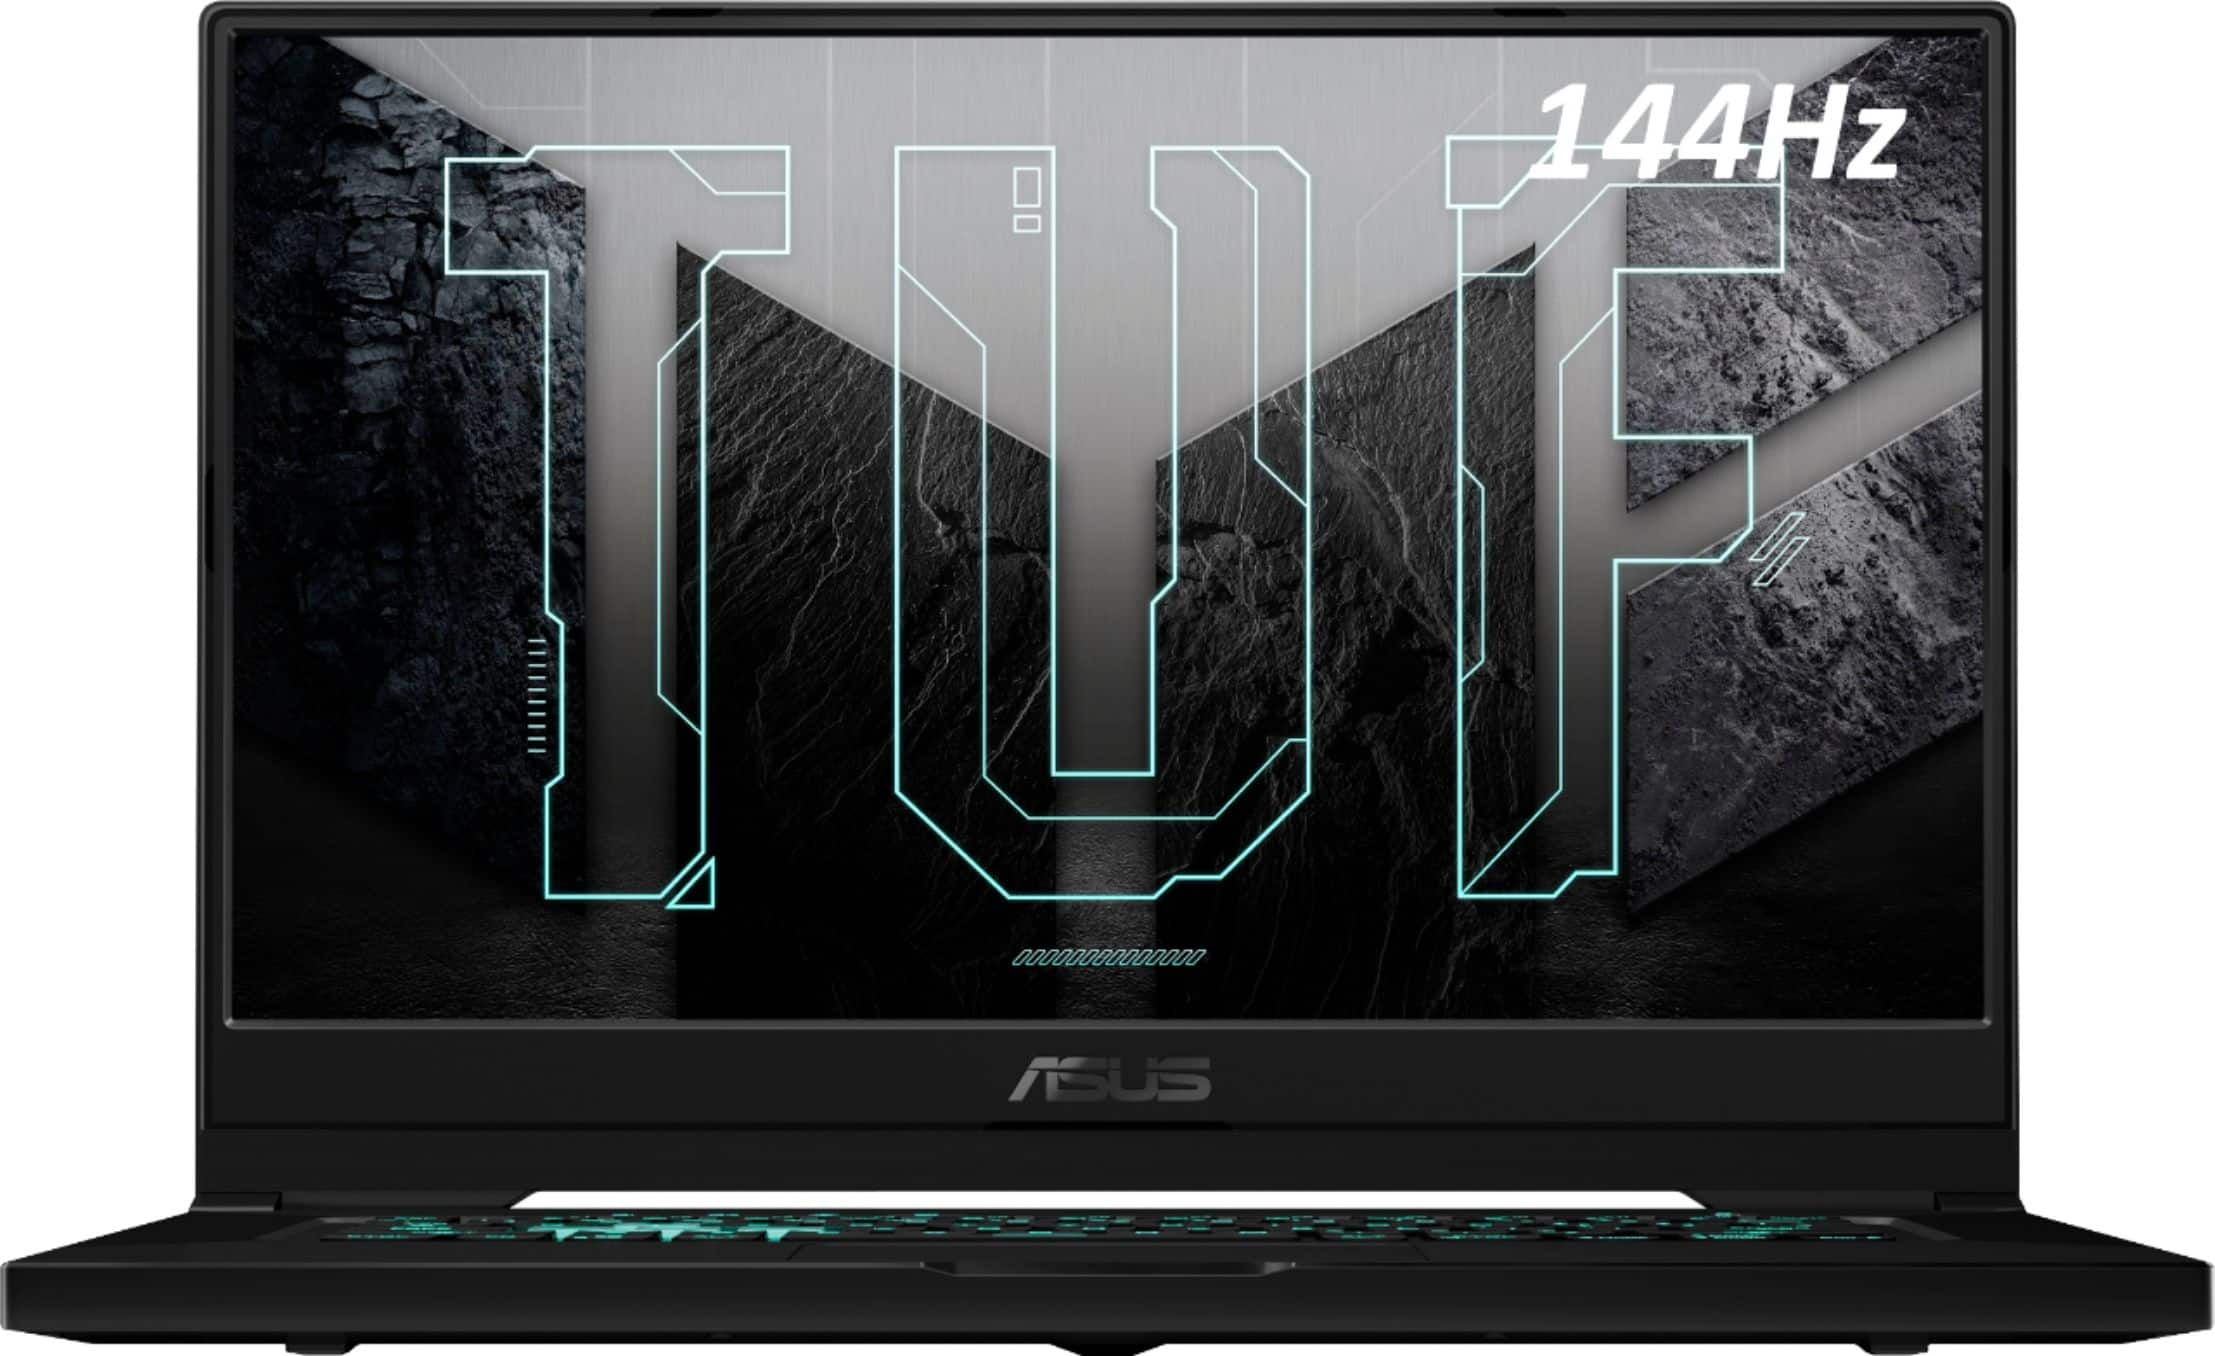 "Asus TUF DASH 15.6"" Intel 11th Gen i7, 16GB Memory NVIDIA GeForce RTX 3060 $1099.99"